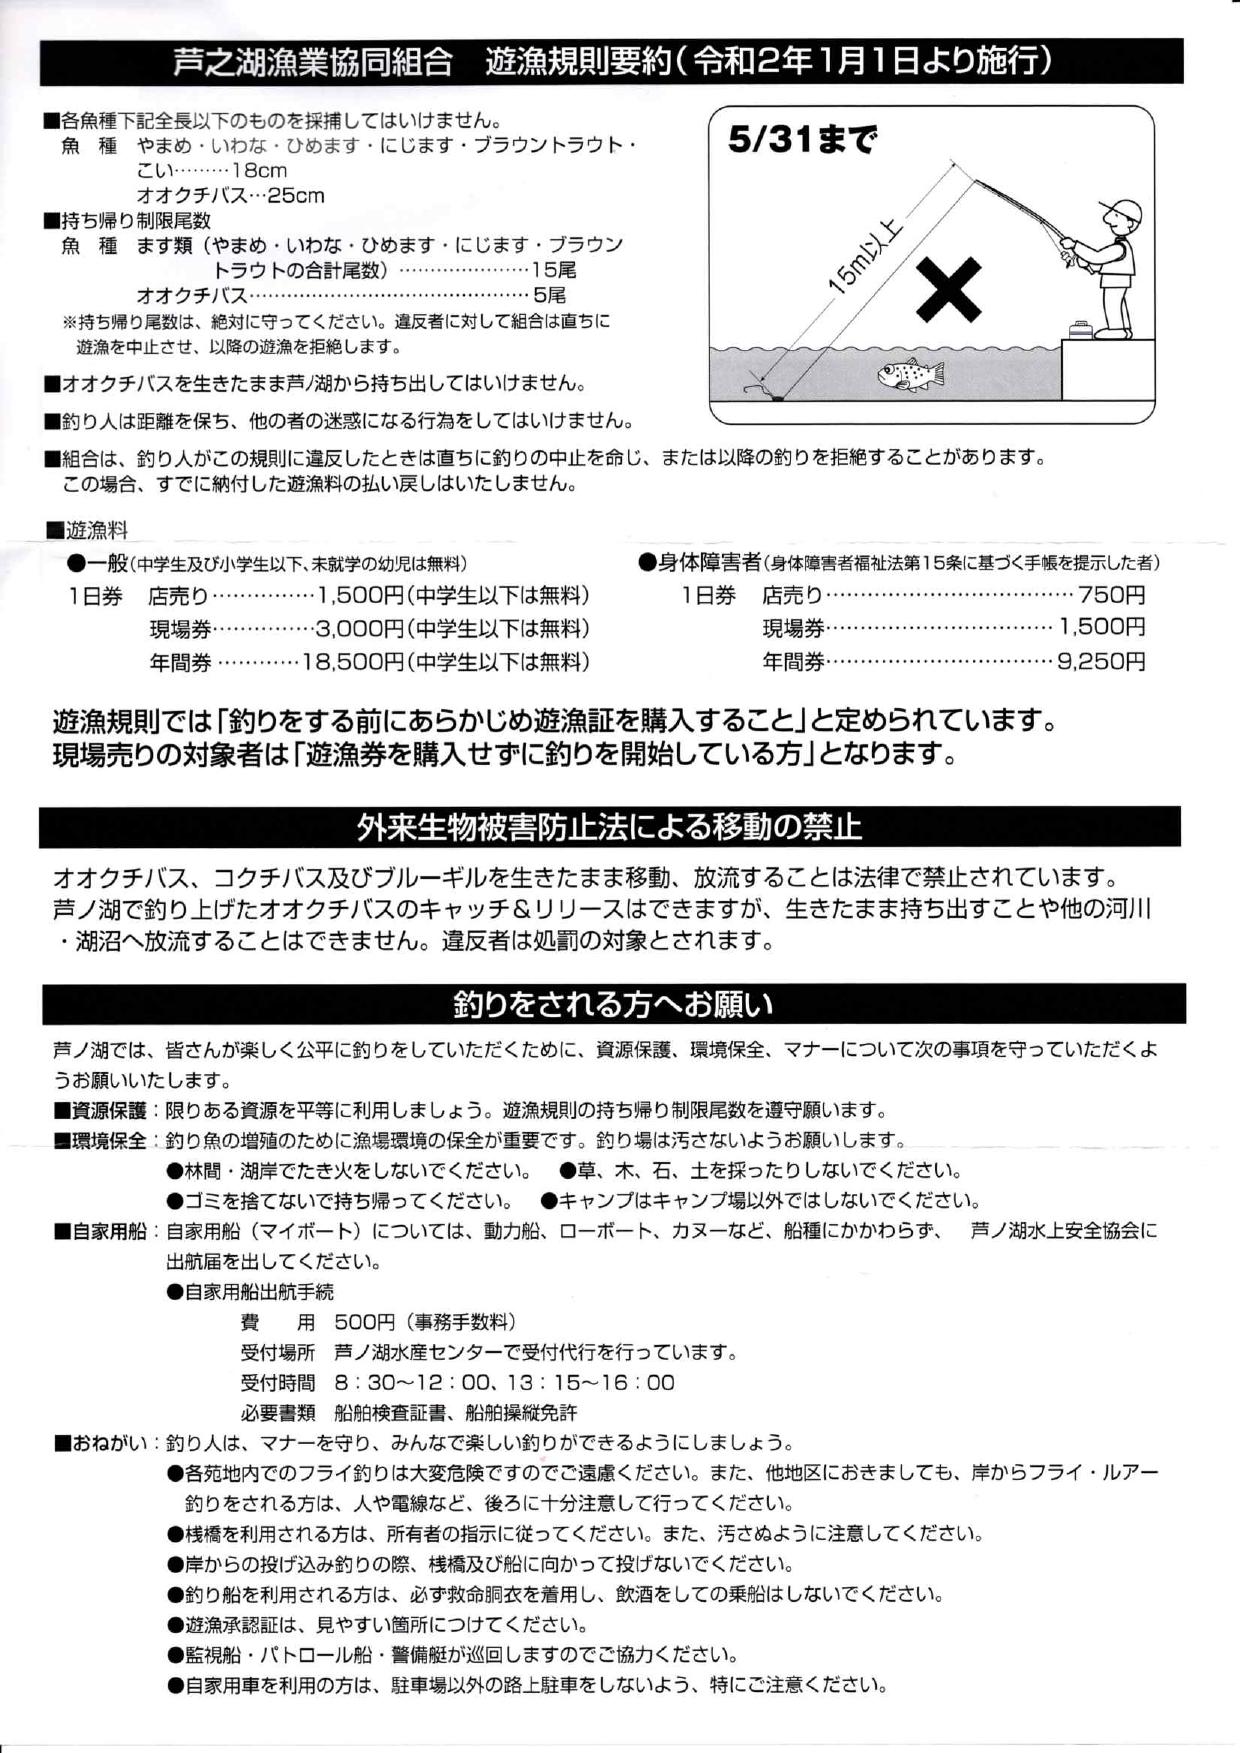 芦ノ湖遊漁規則2020